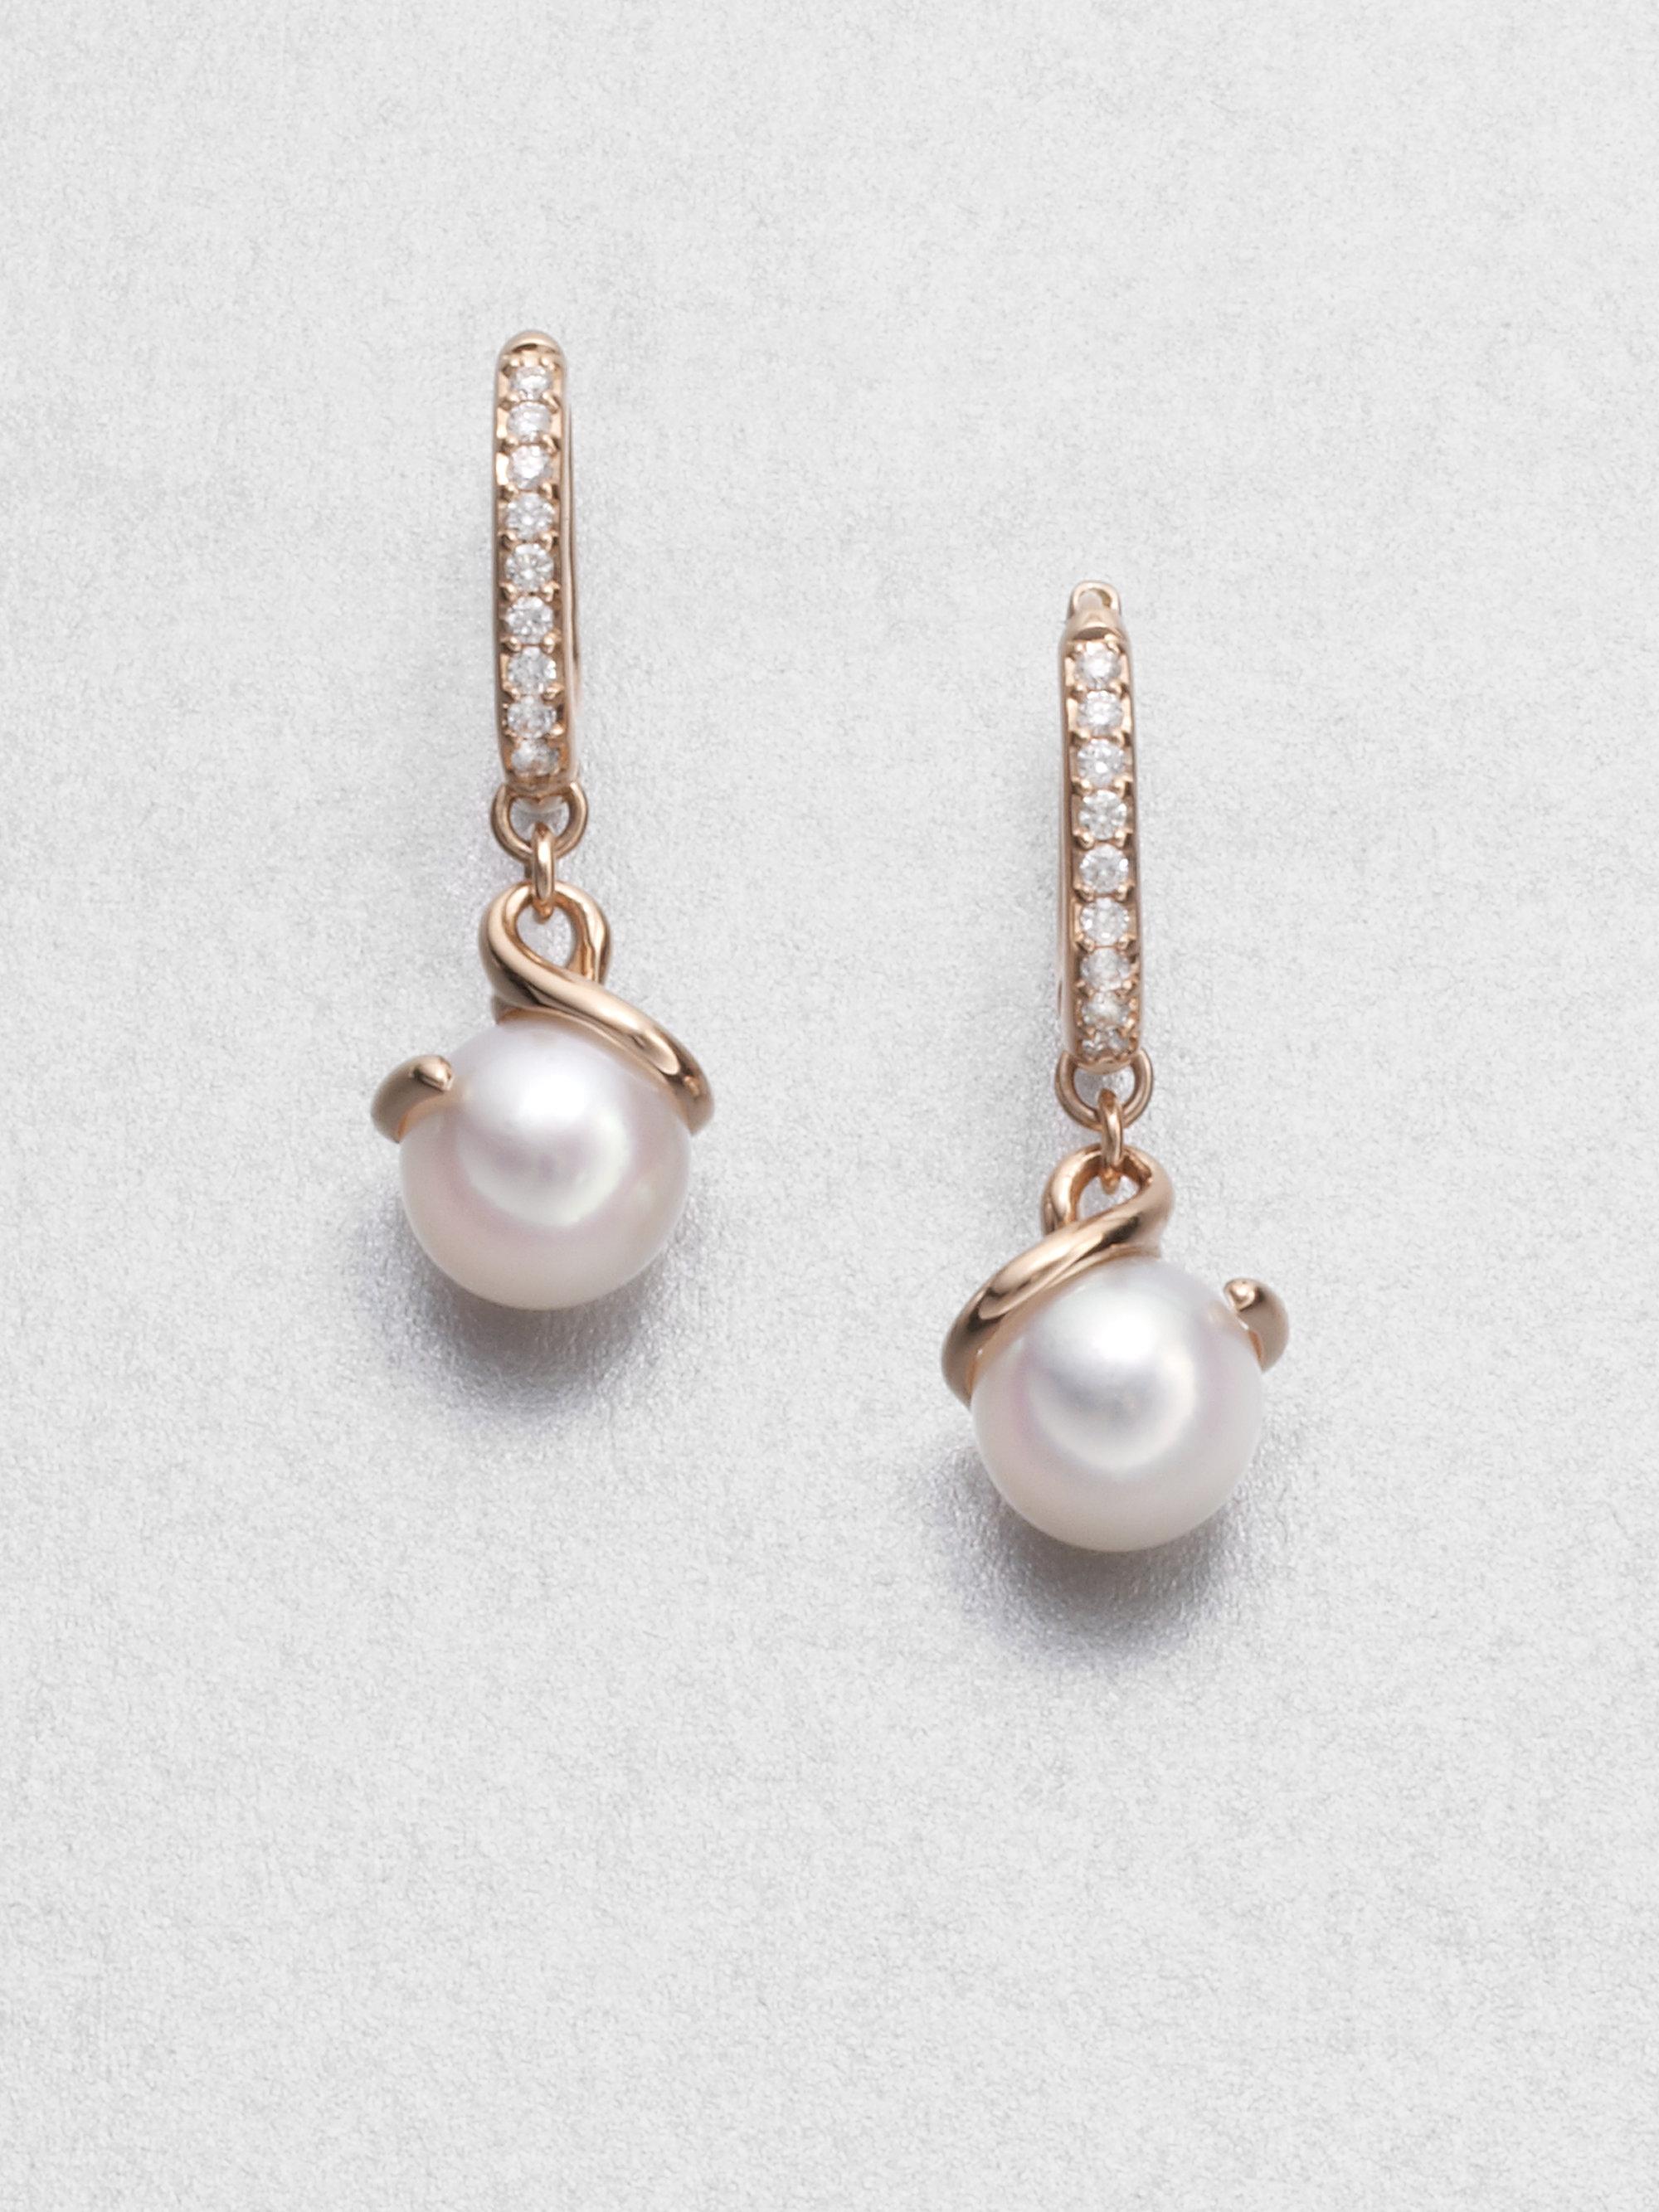 9b6cfdcf1 Mikimoto Twist 7Mm White Cultured Akoya Pearl, Diamond & 18K Rose ...